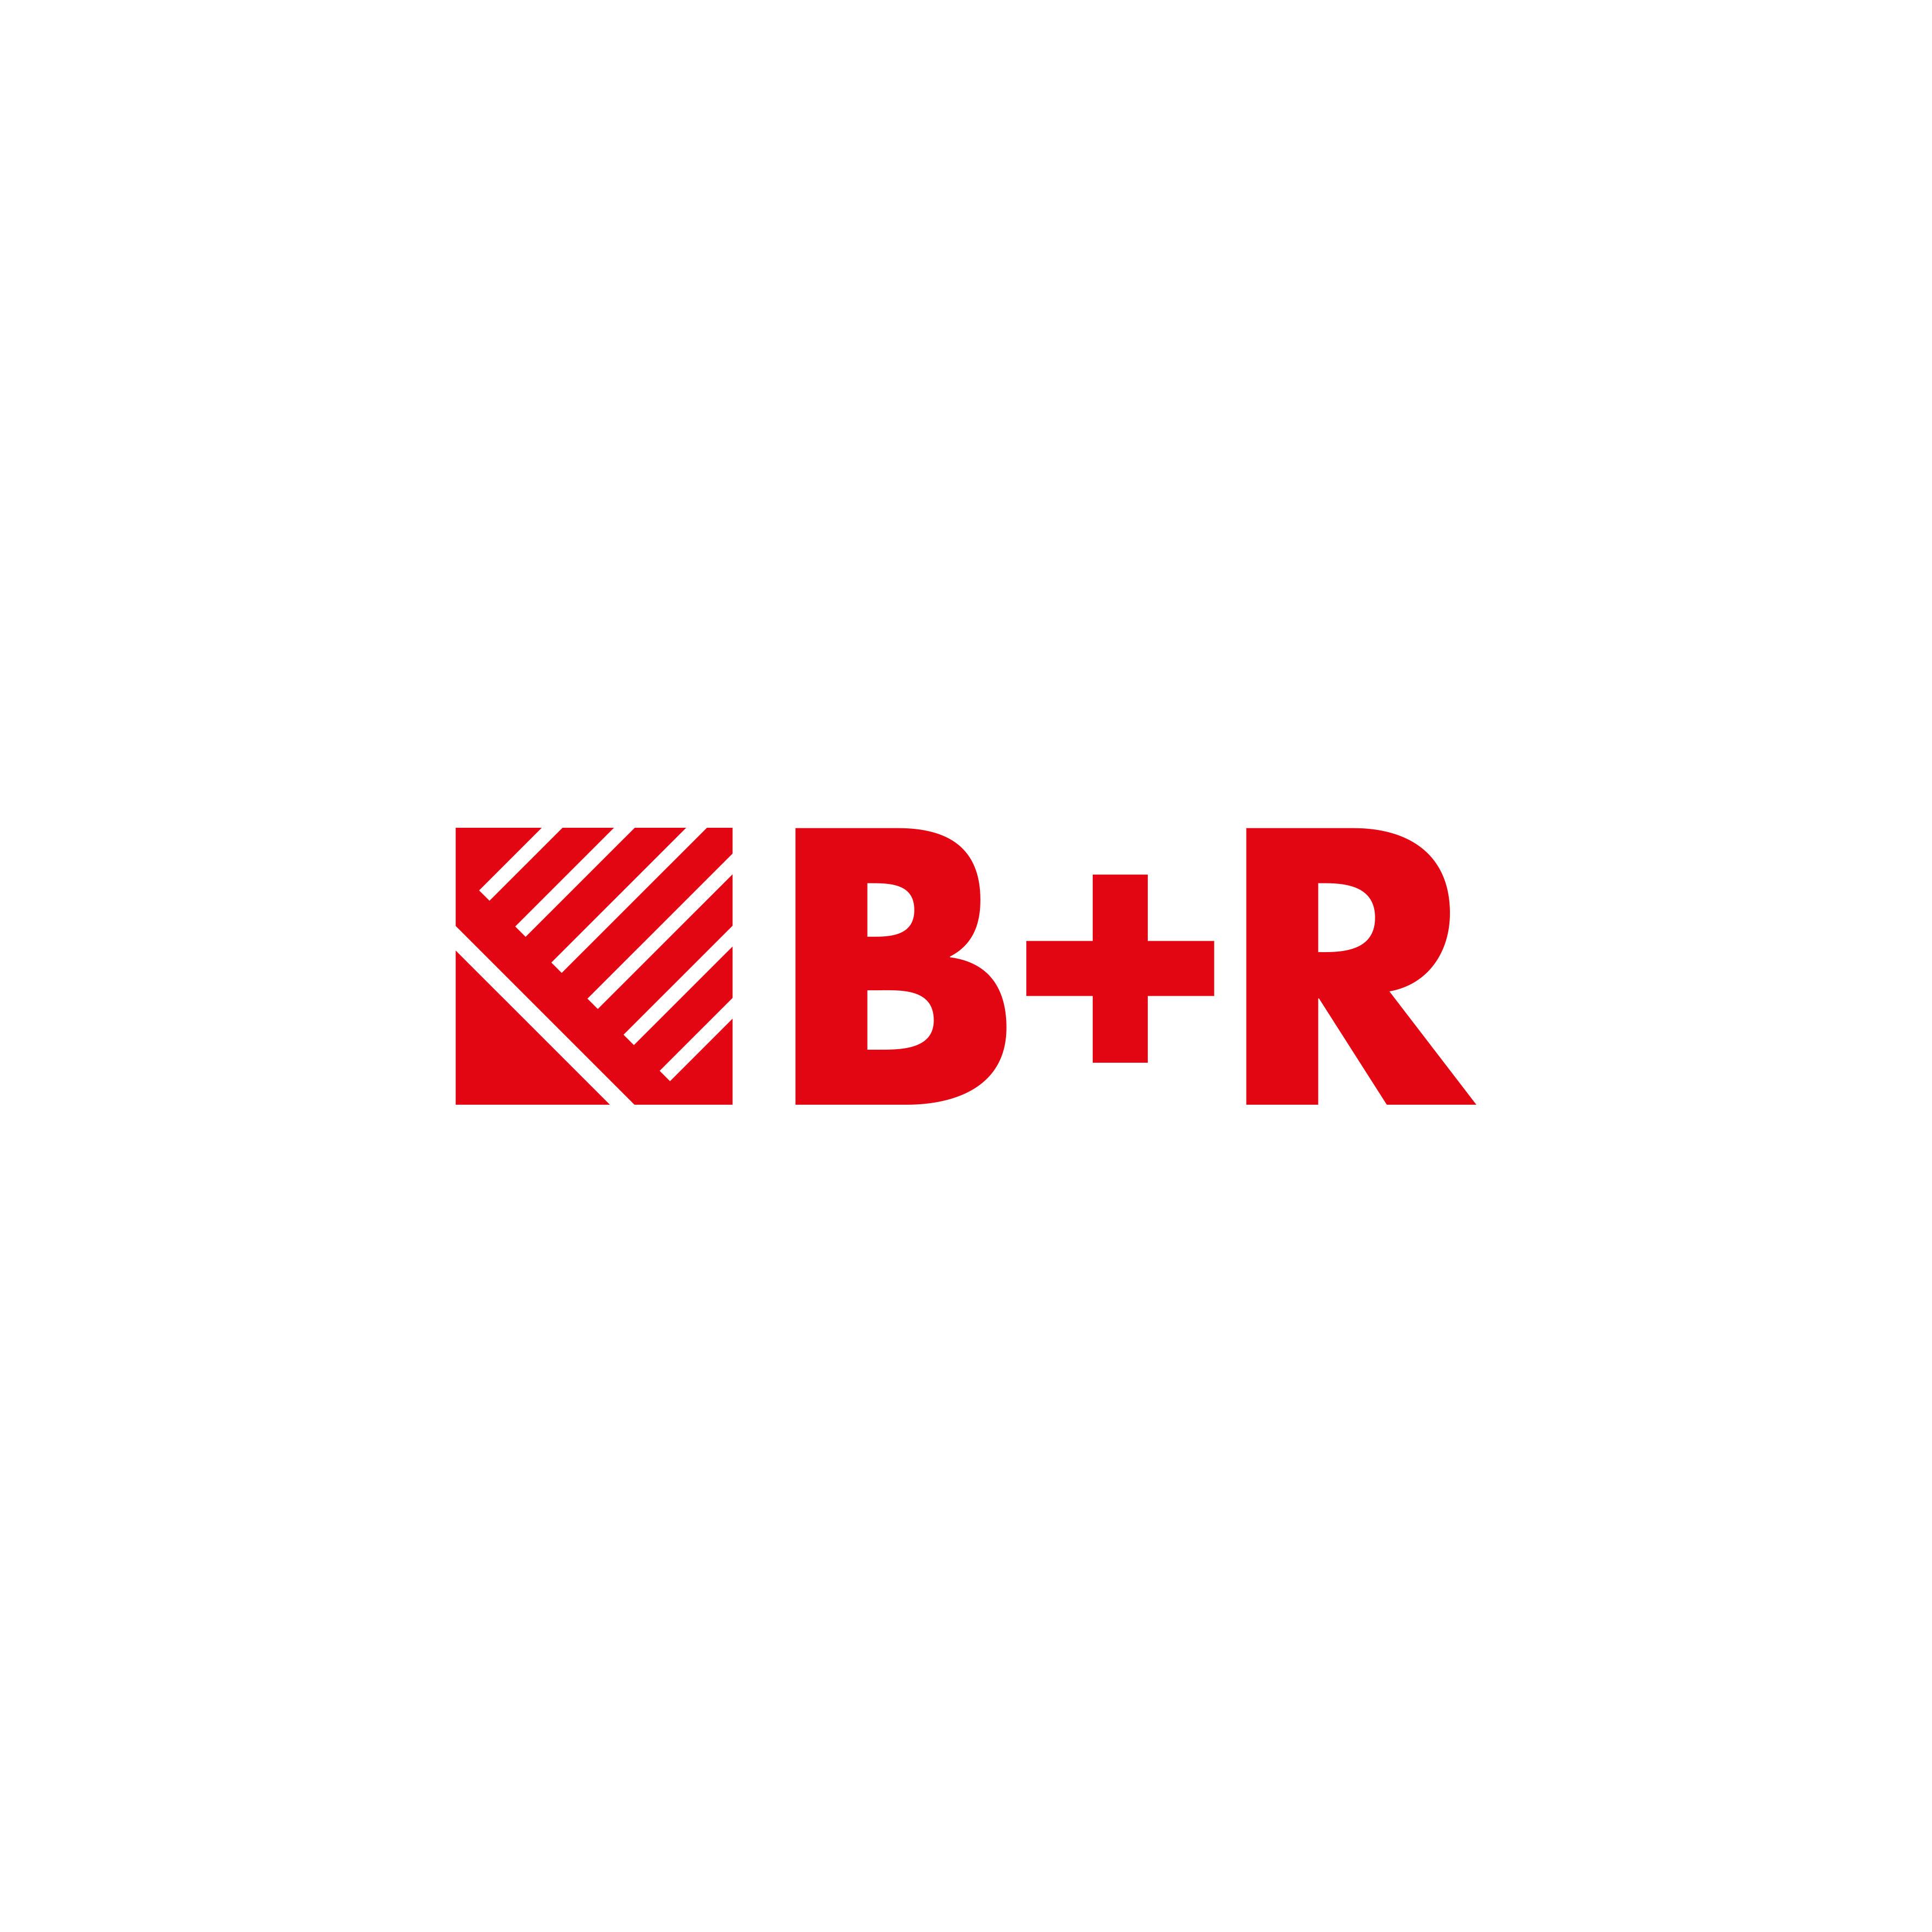 B + R Baustoff-Handel und -Recycling Düsseldorf-Neuss GmbH